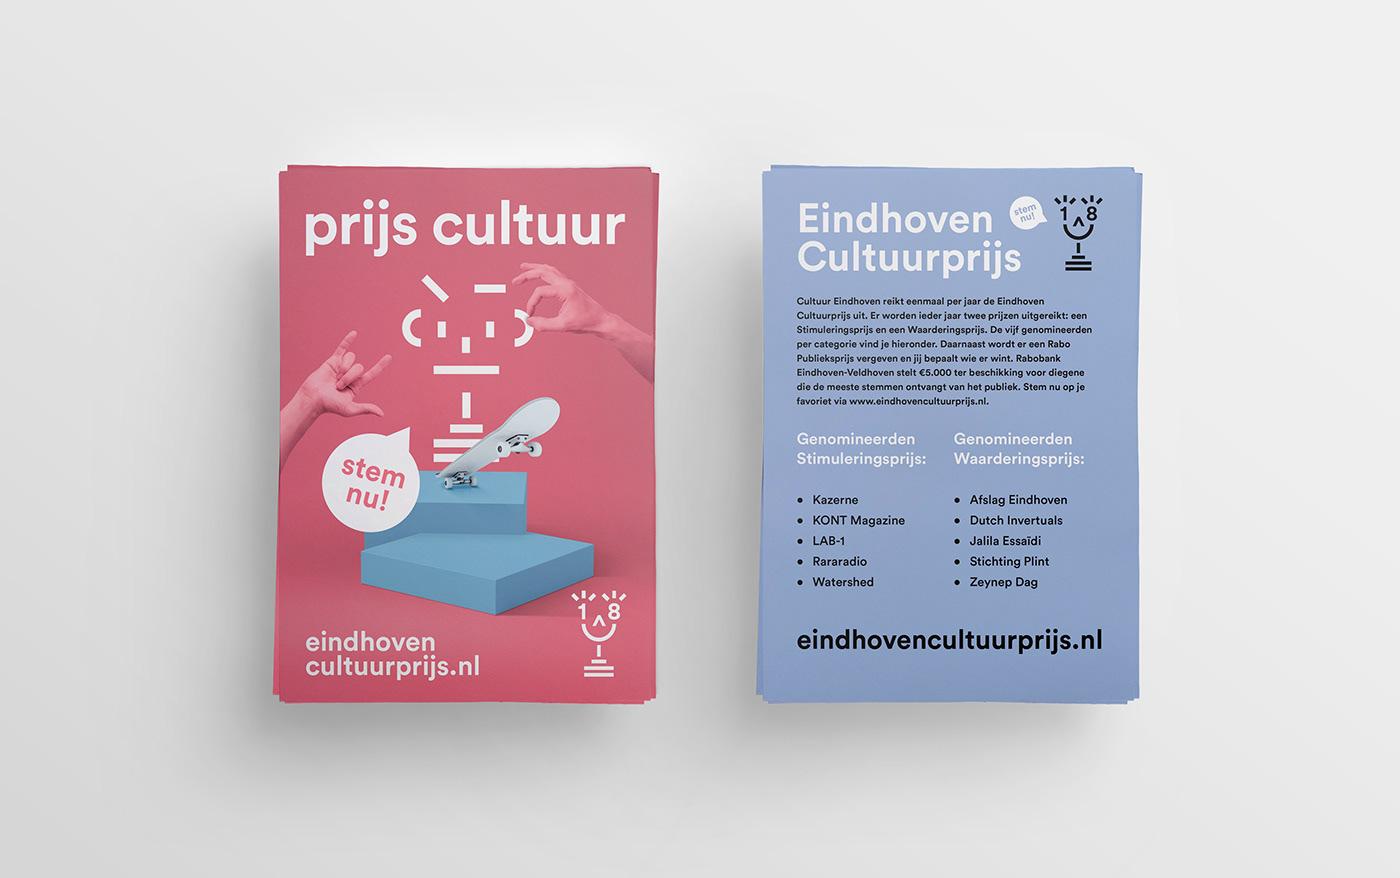 cultural cultuur eindhoven Awards digital collage Cultuurprijs poster campagne campaign